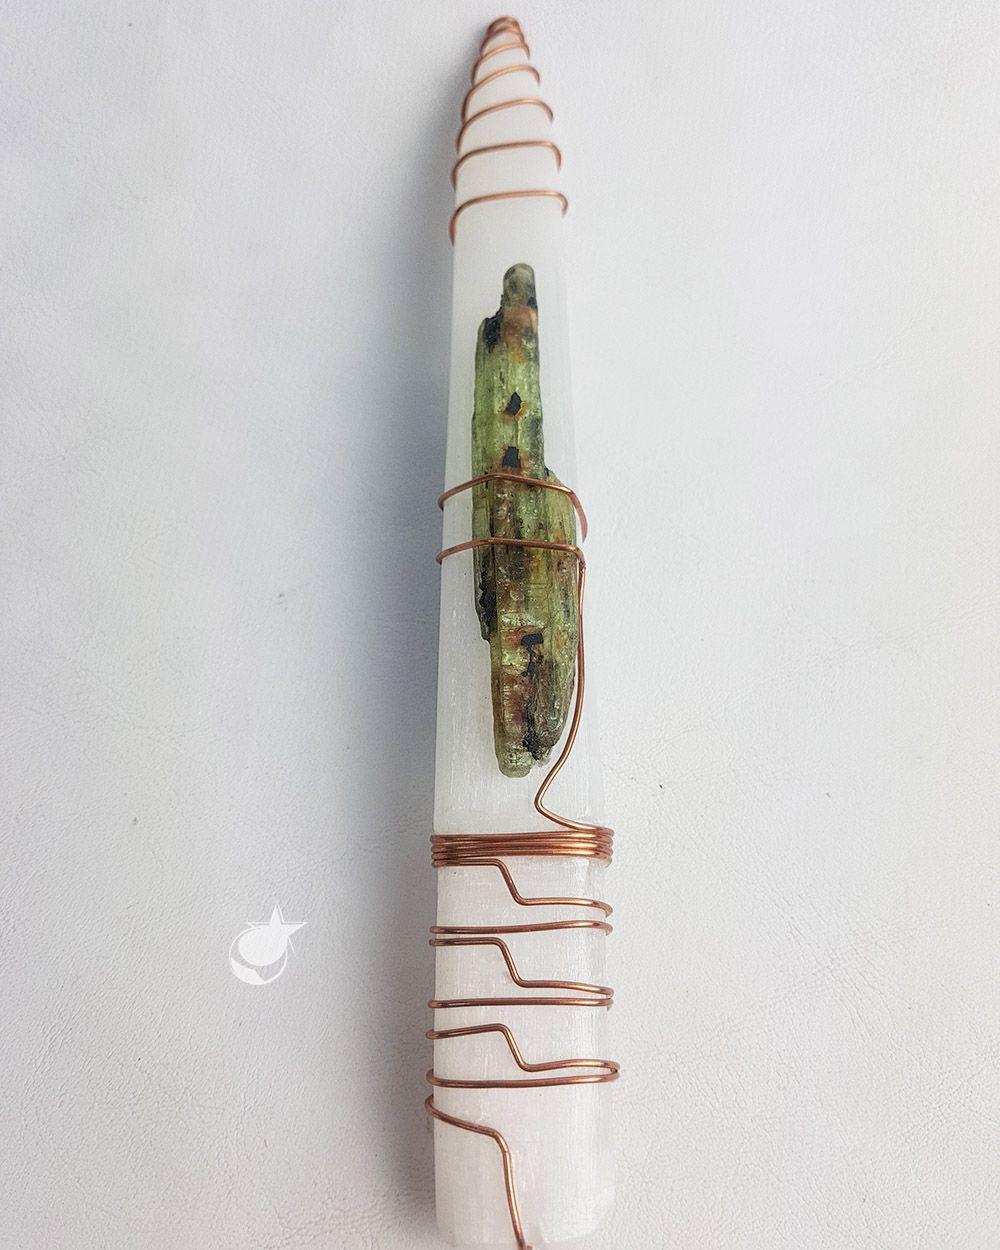 ESPADA ARTESANAL DE SELENITA COM CIANITAS VERDE E AZUL E FIO DE COBRE PARA LIMPEZA ESPIRITUAL - 21,5 cm